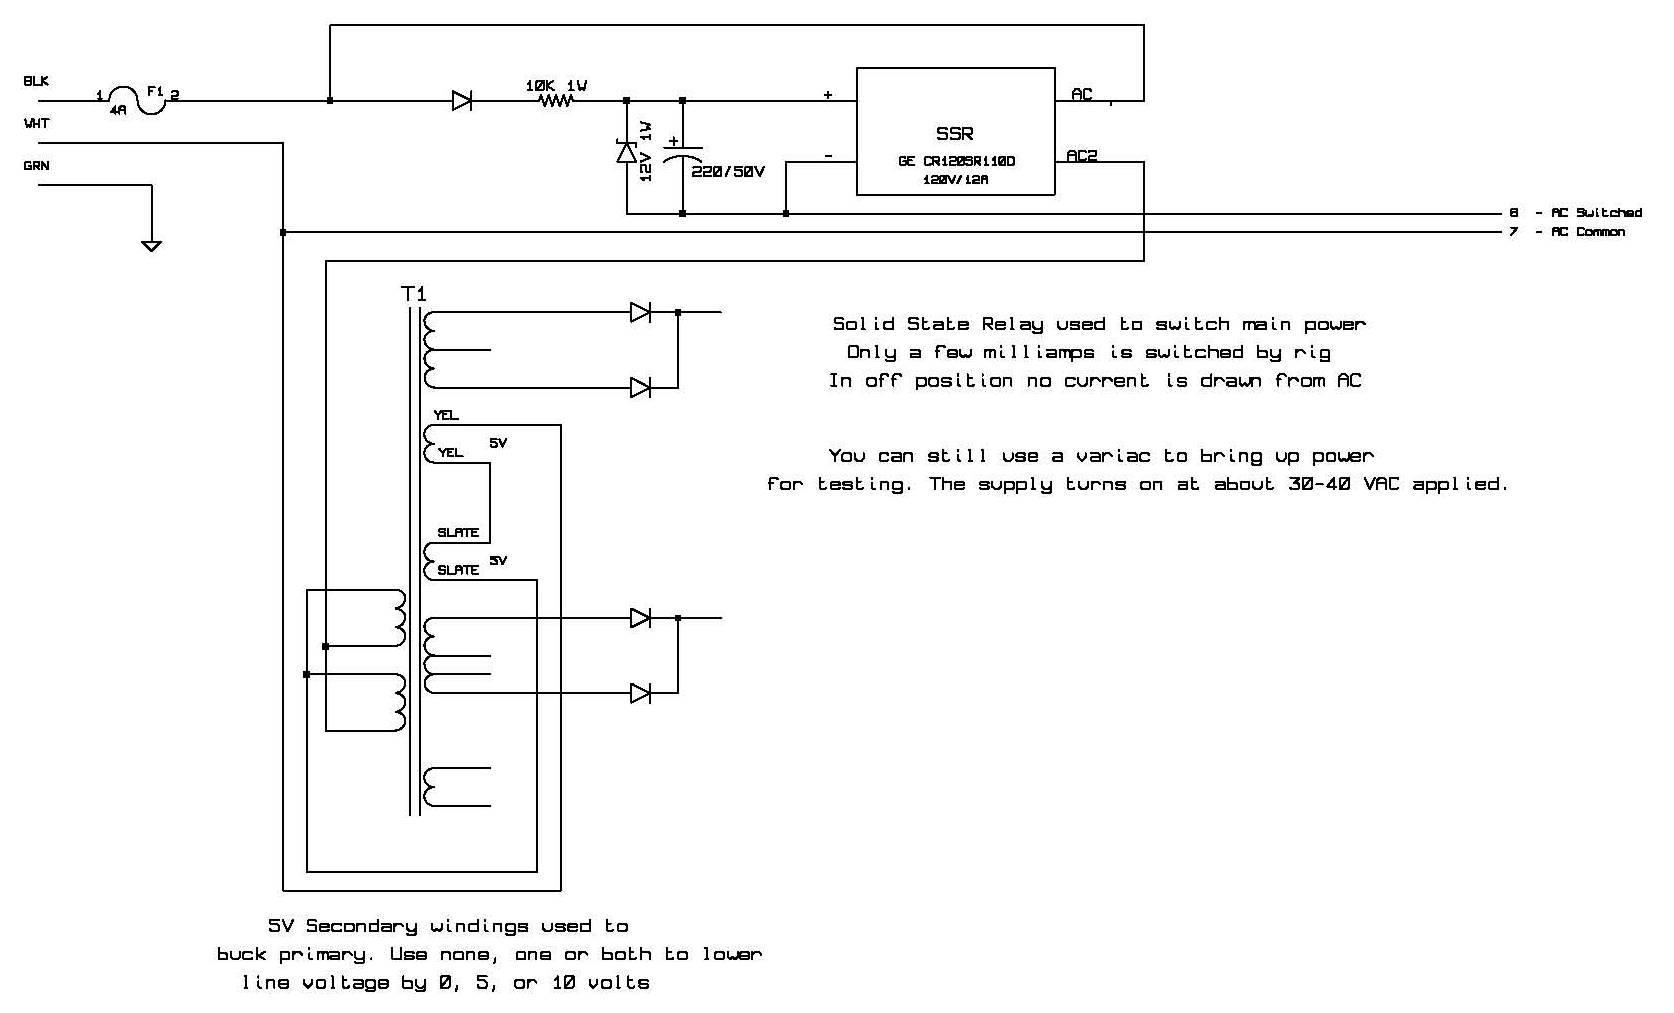 1990 bluebird bus wiring diagram car cigarette lighter socket collins service